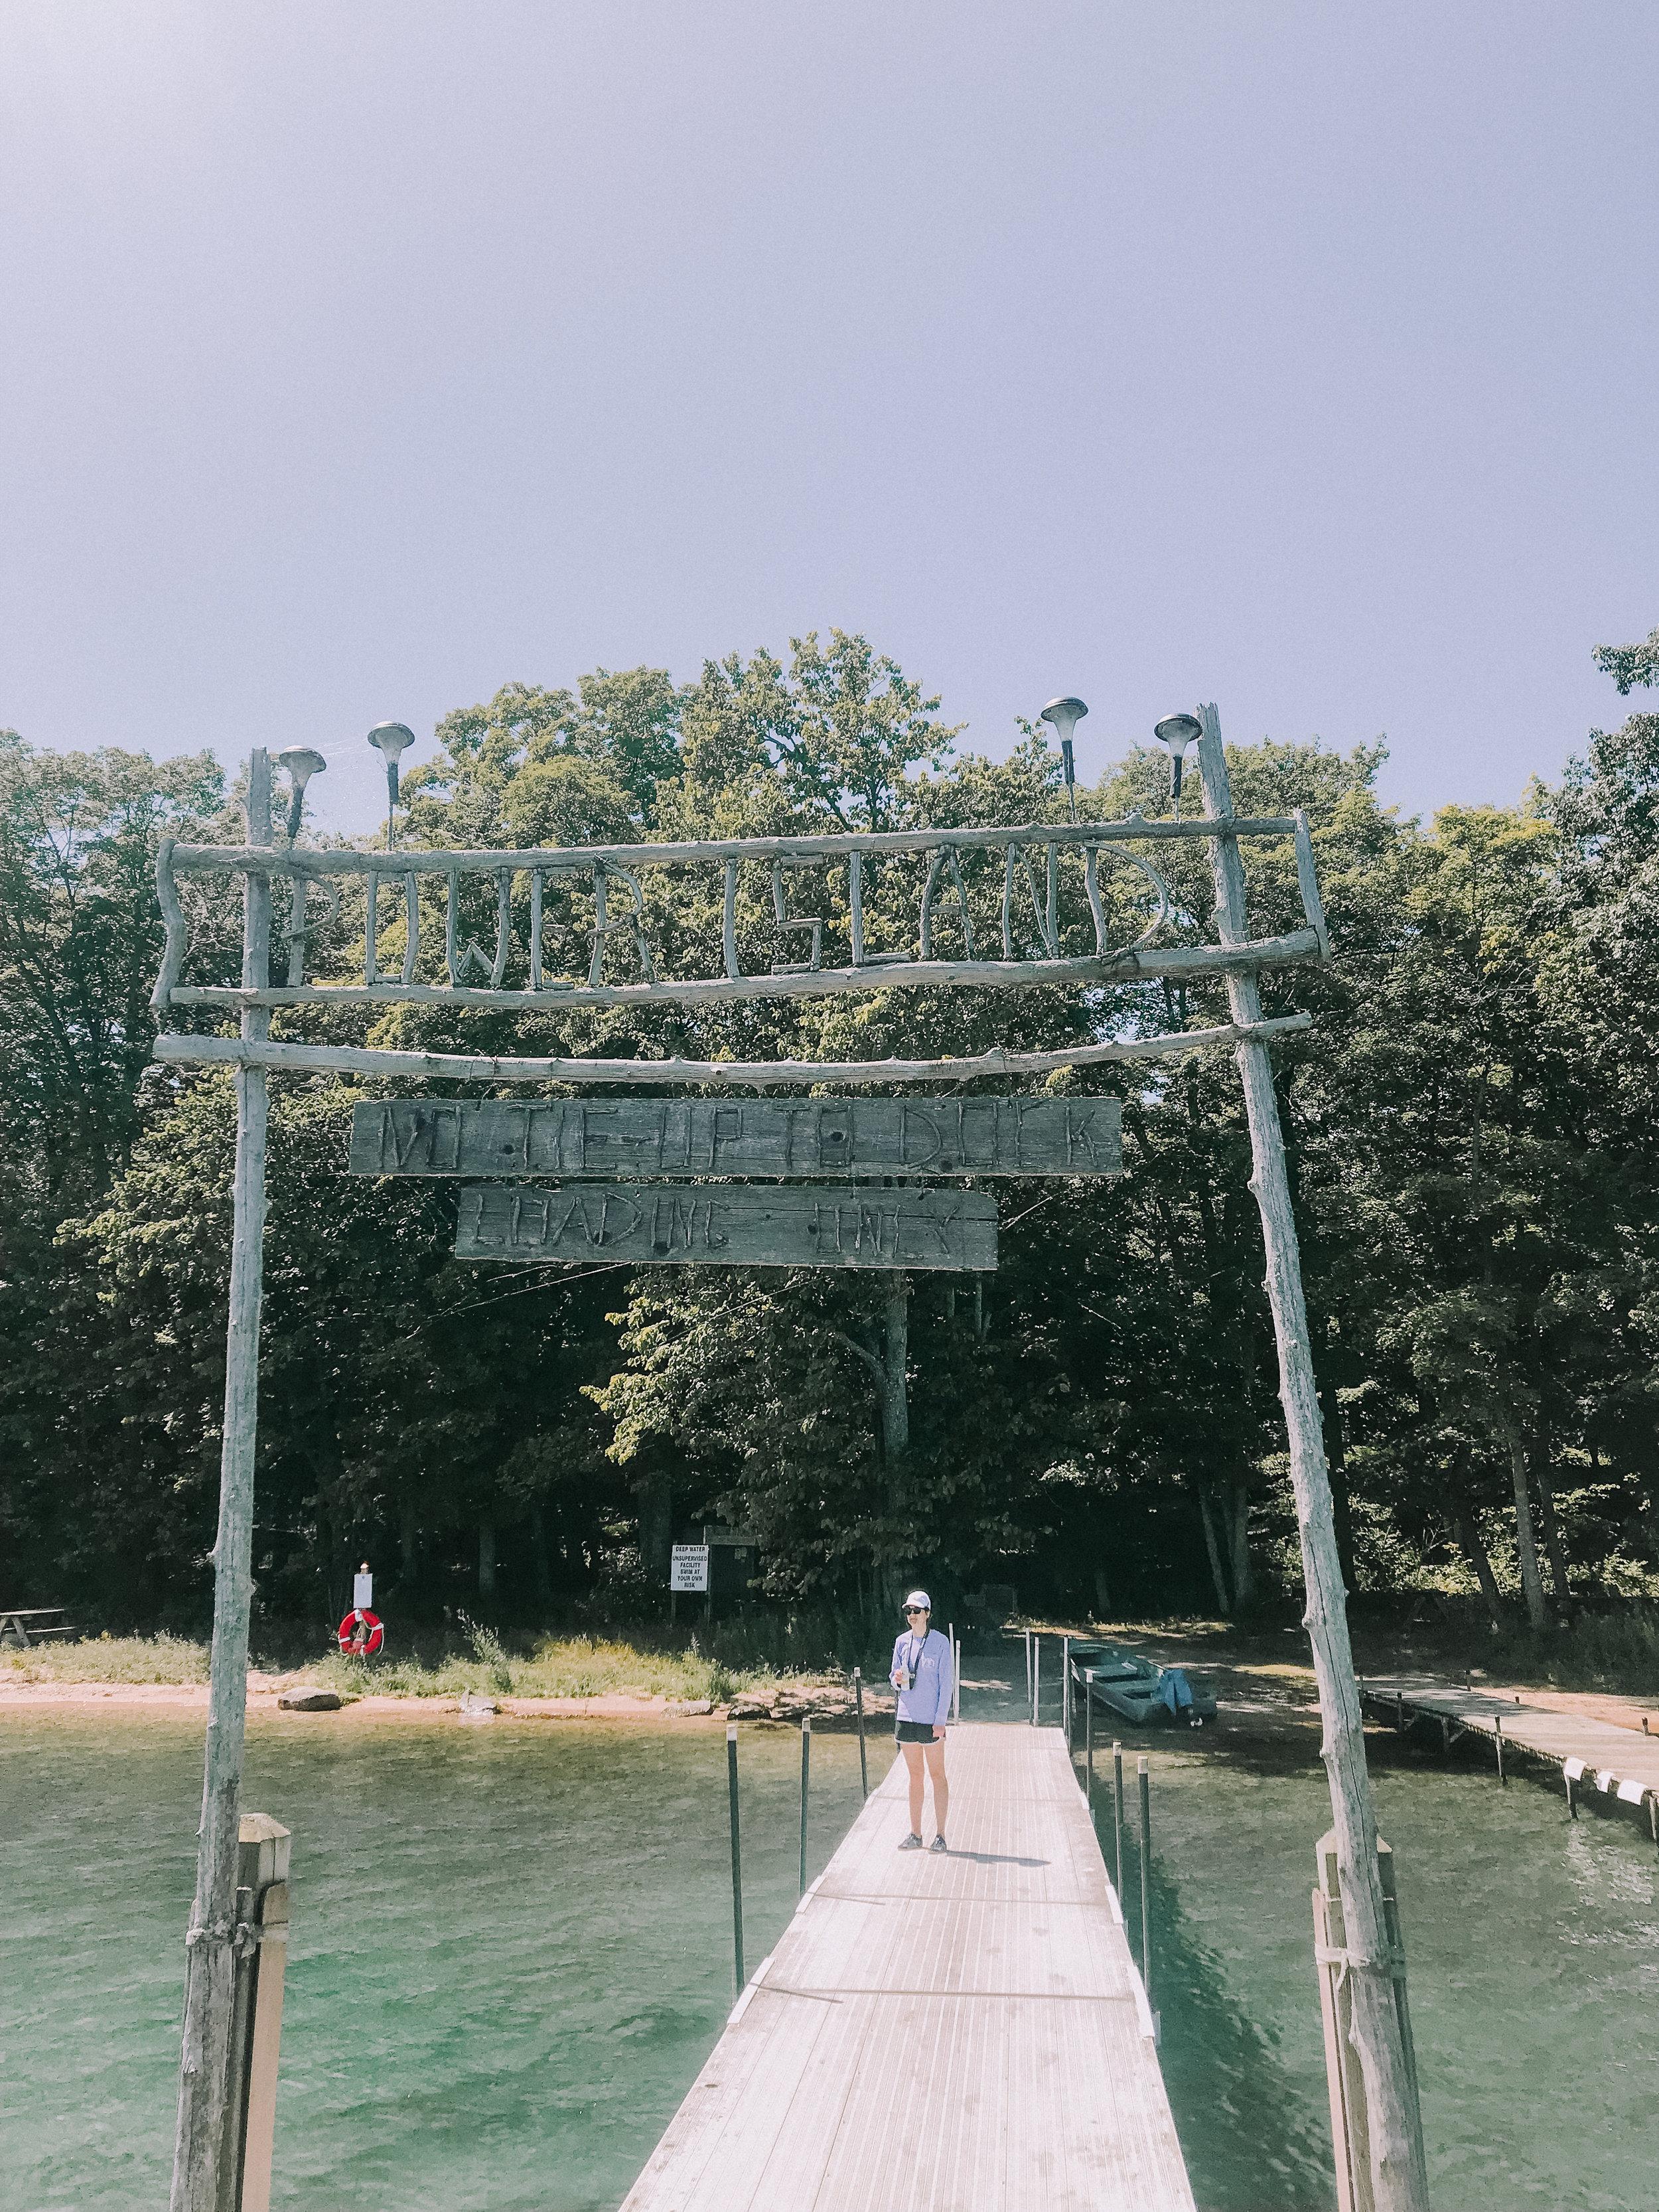 Traverse City, MI Travel Diary Power Island